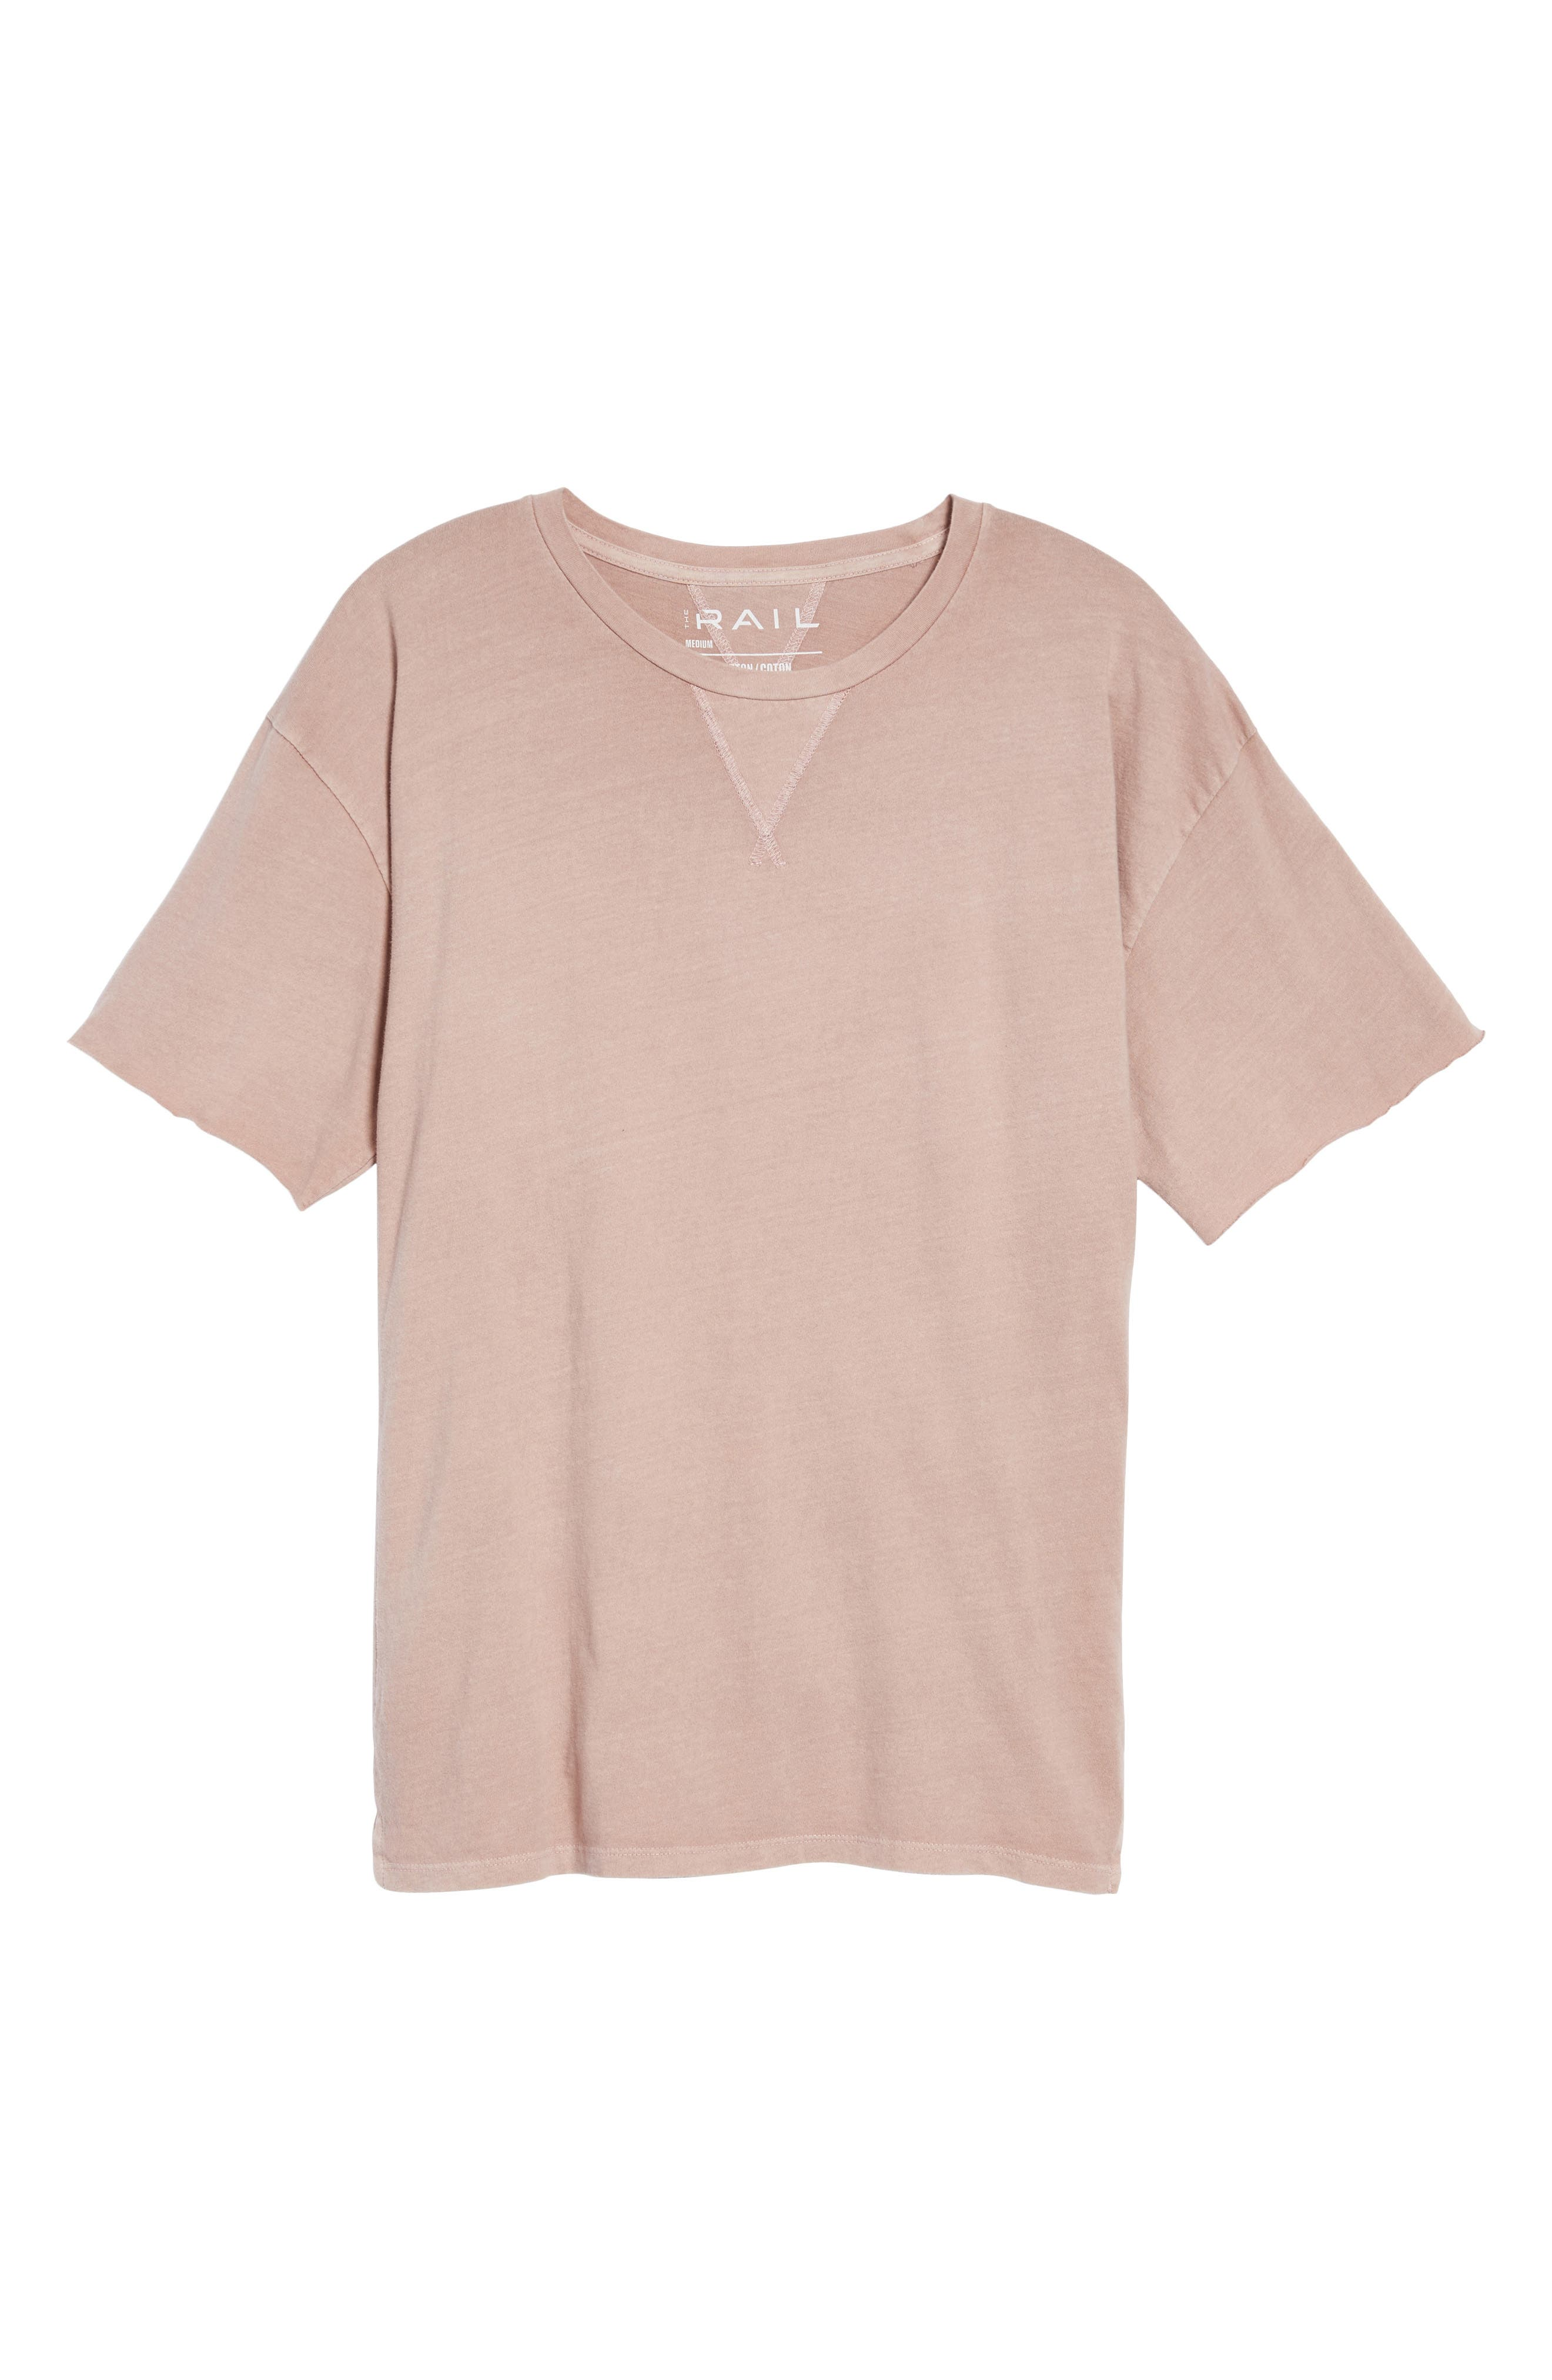 Mineral Wash T-Shirt,                             Alternate thumbnail 6, color,                             Pink Adobe